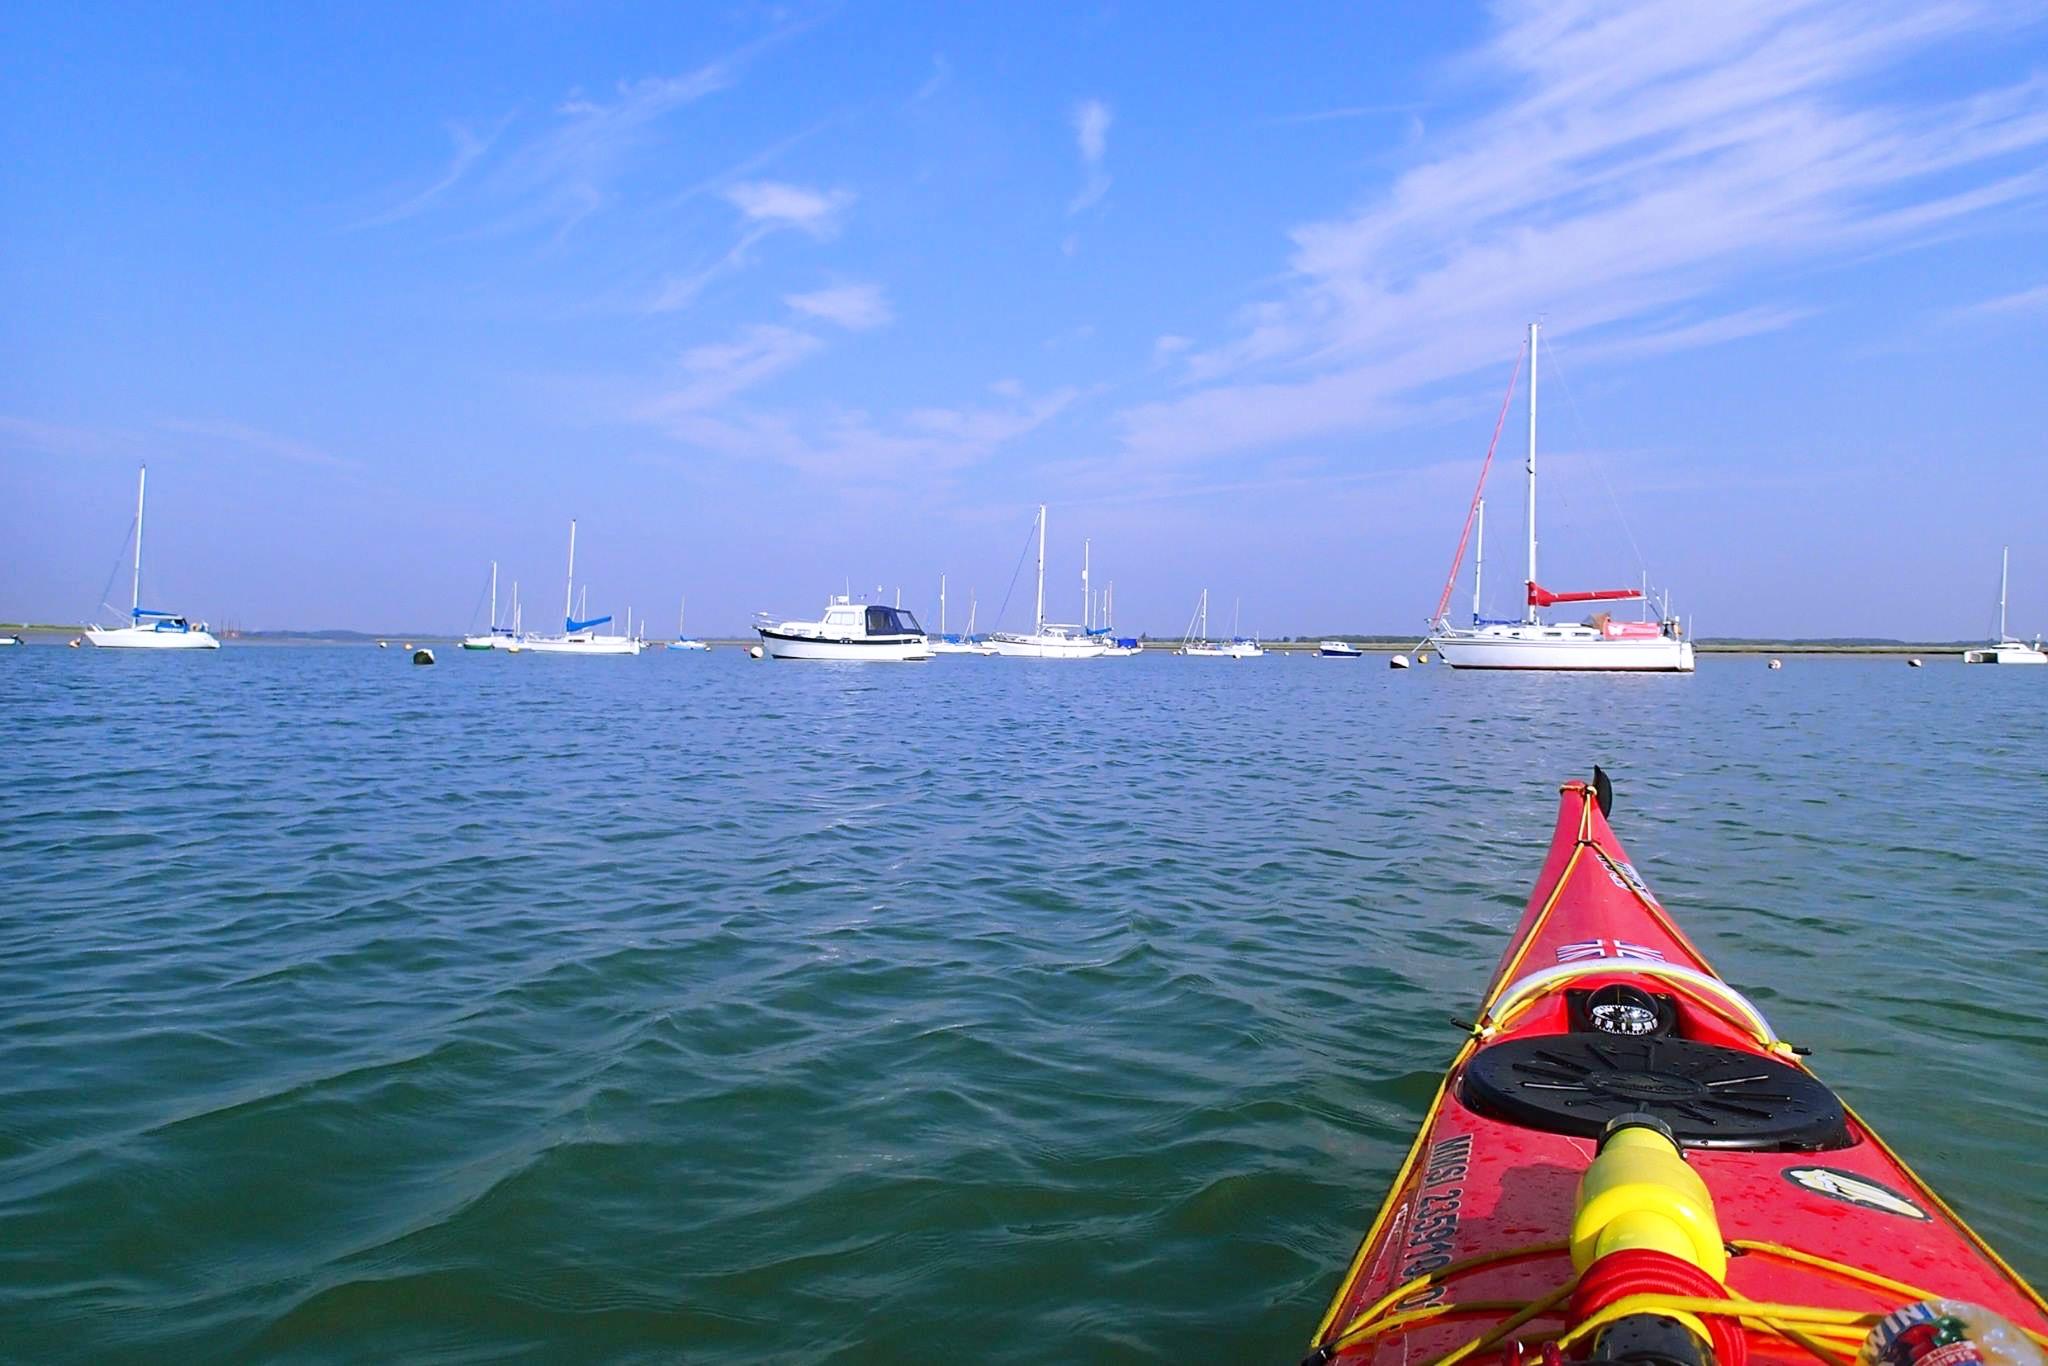 kayak-suffolk-coast-august-bank-holiday-adventure